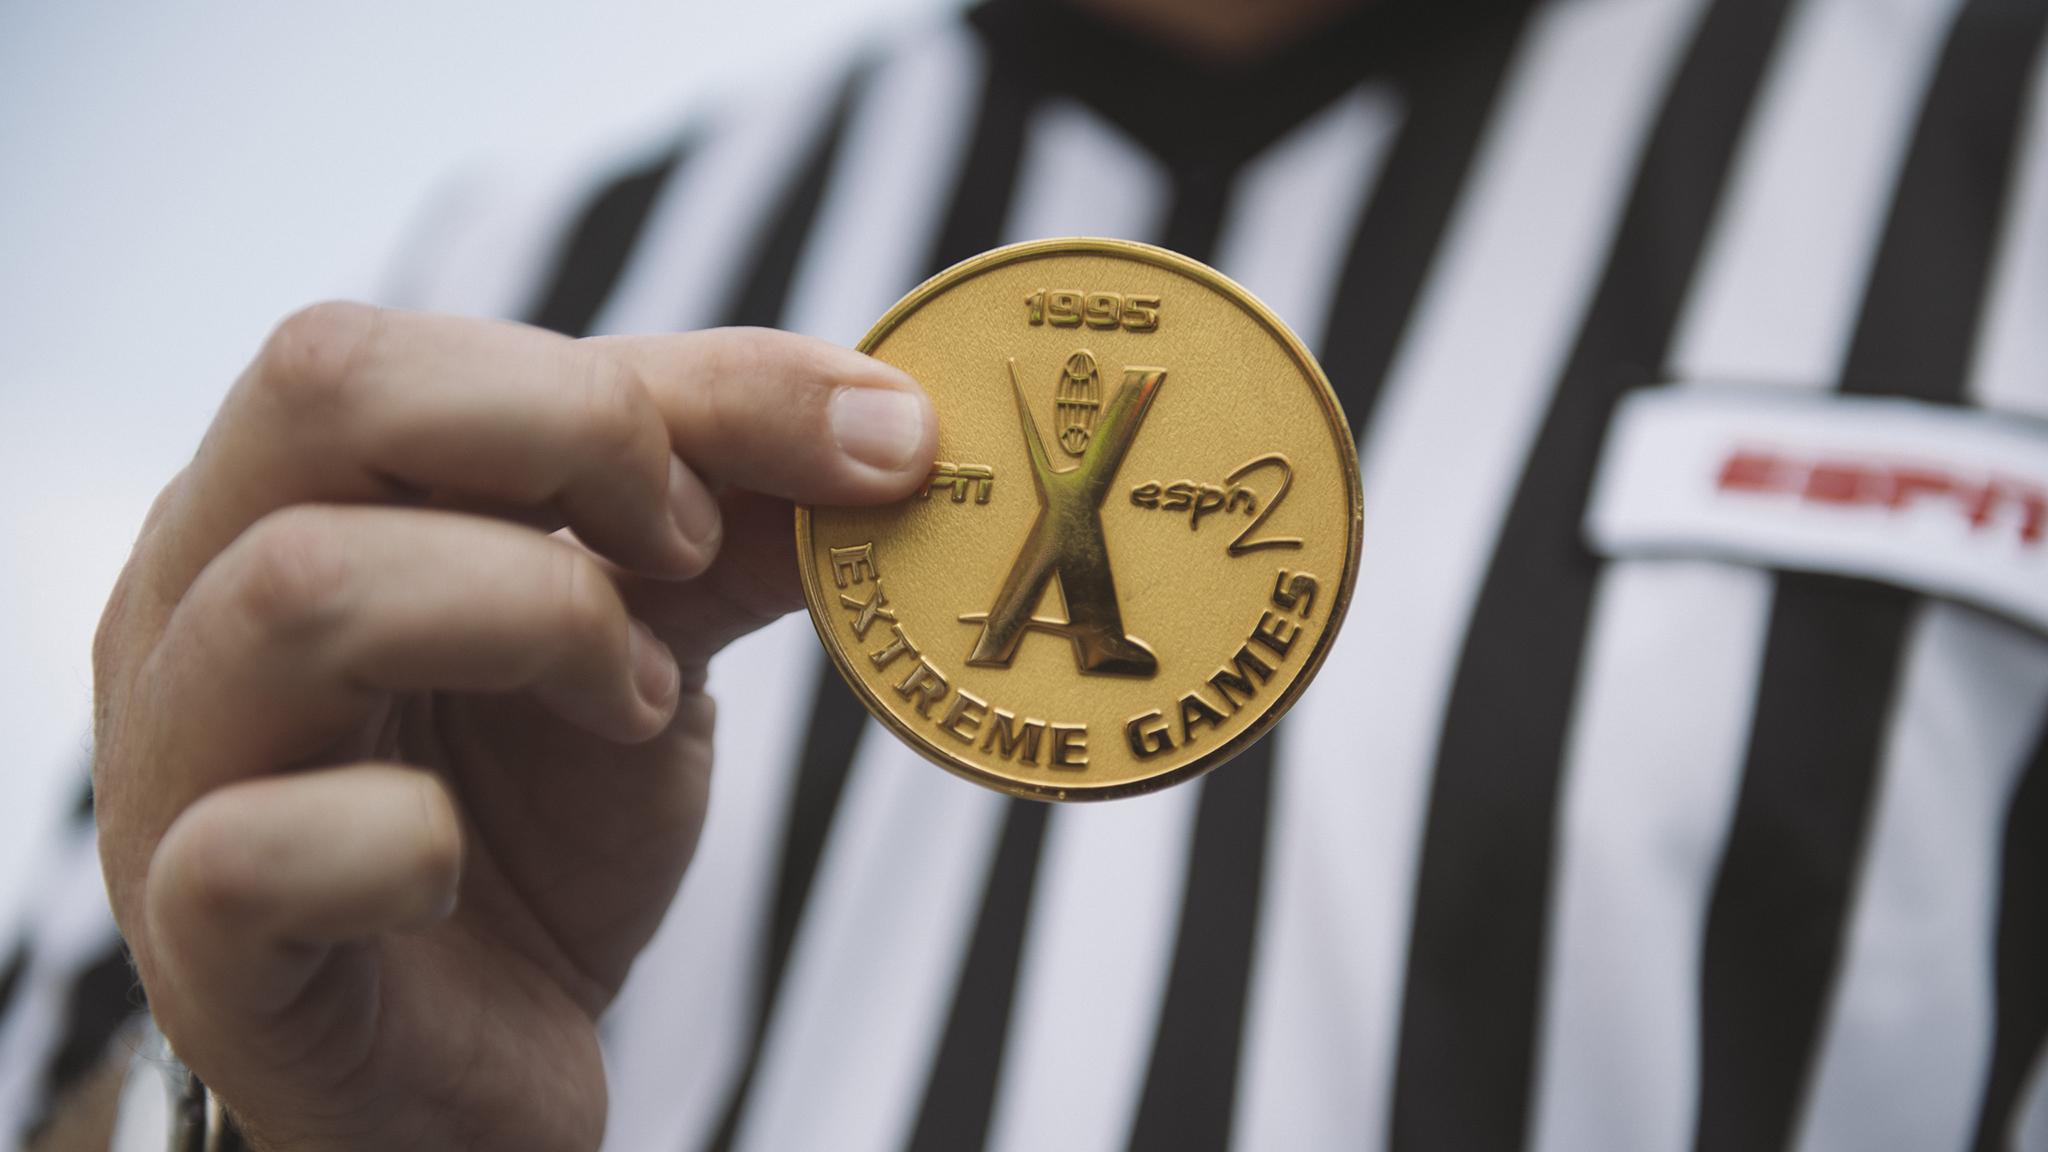 The coin flip